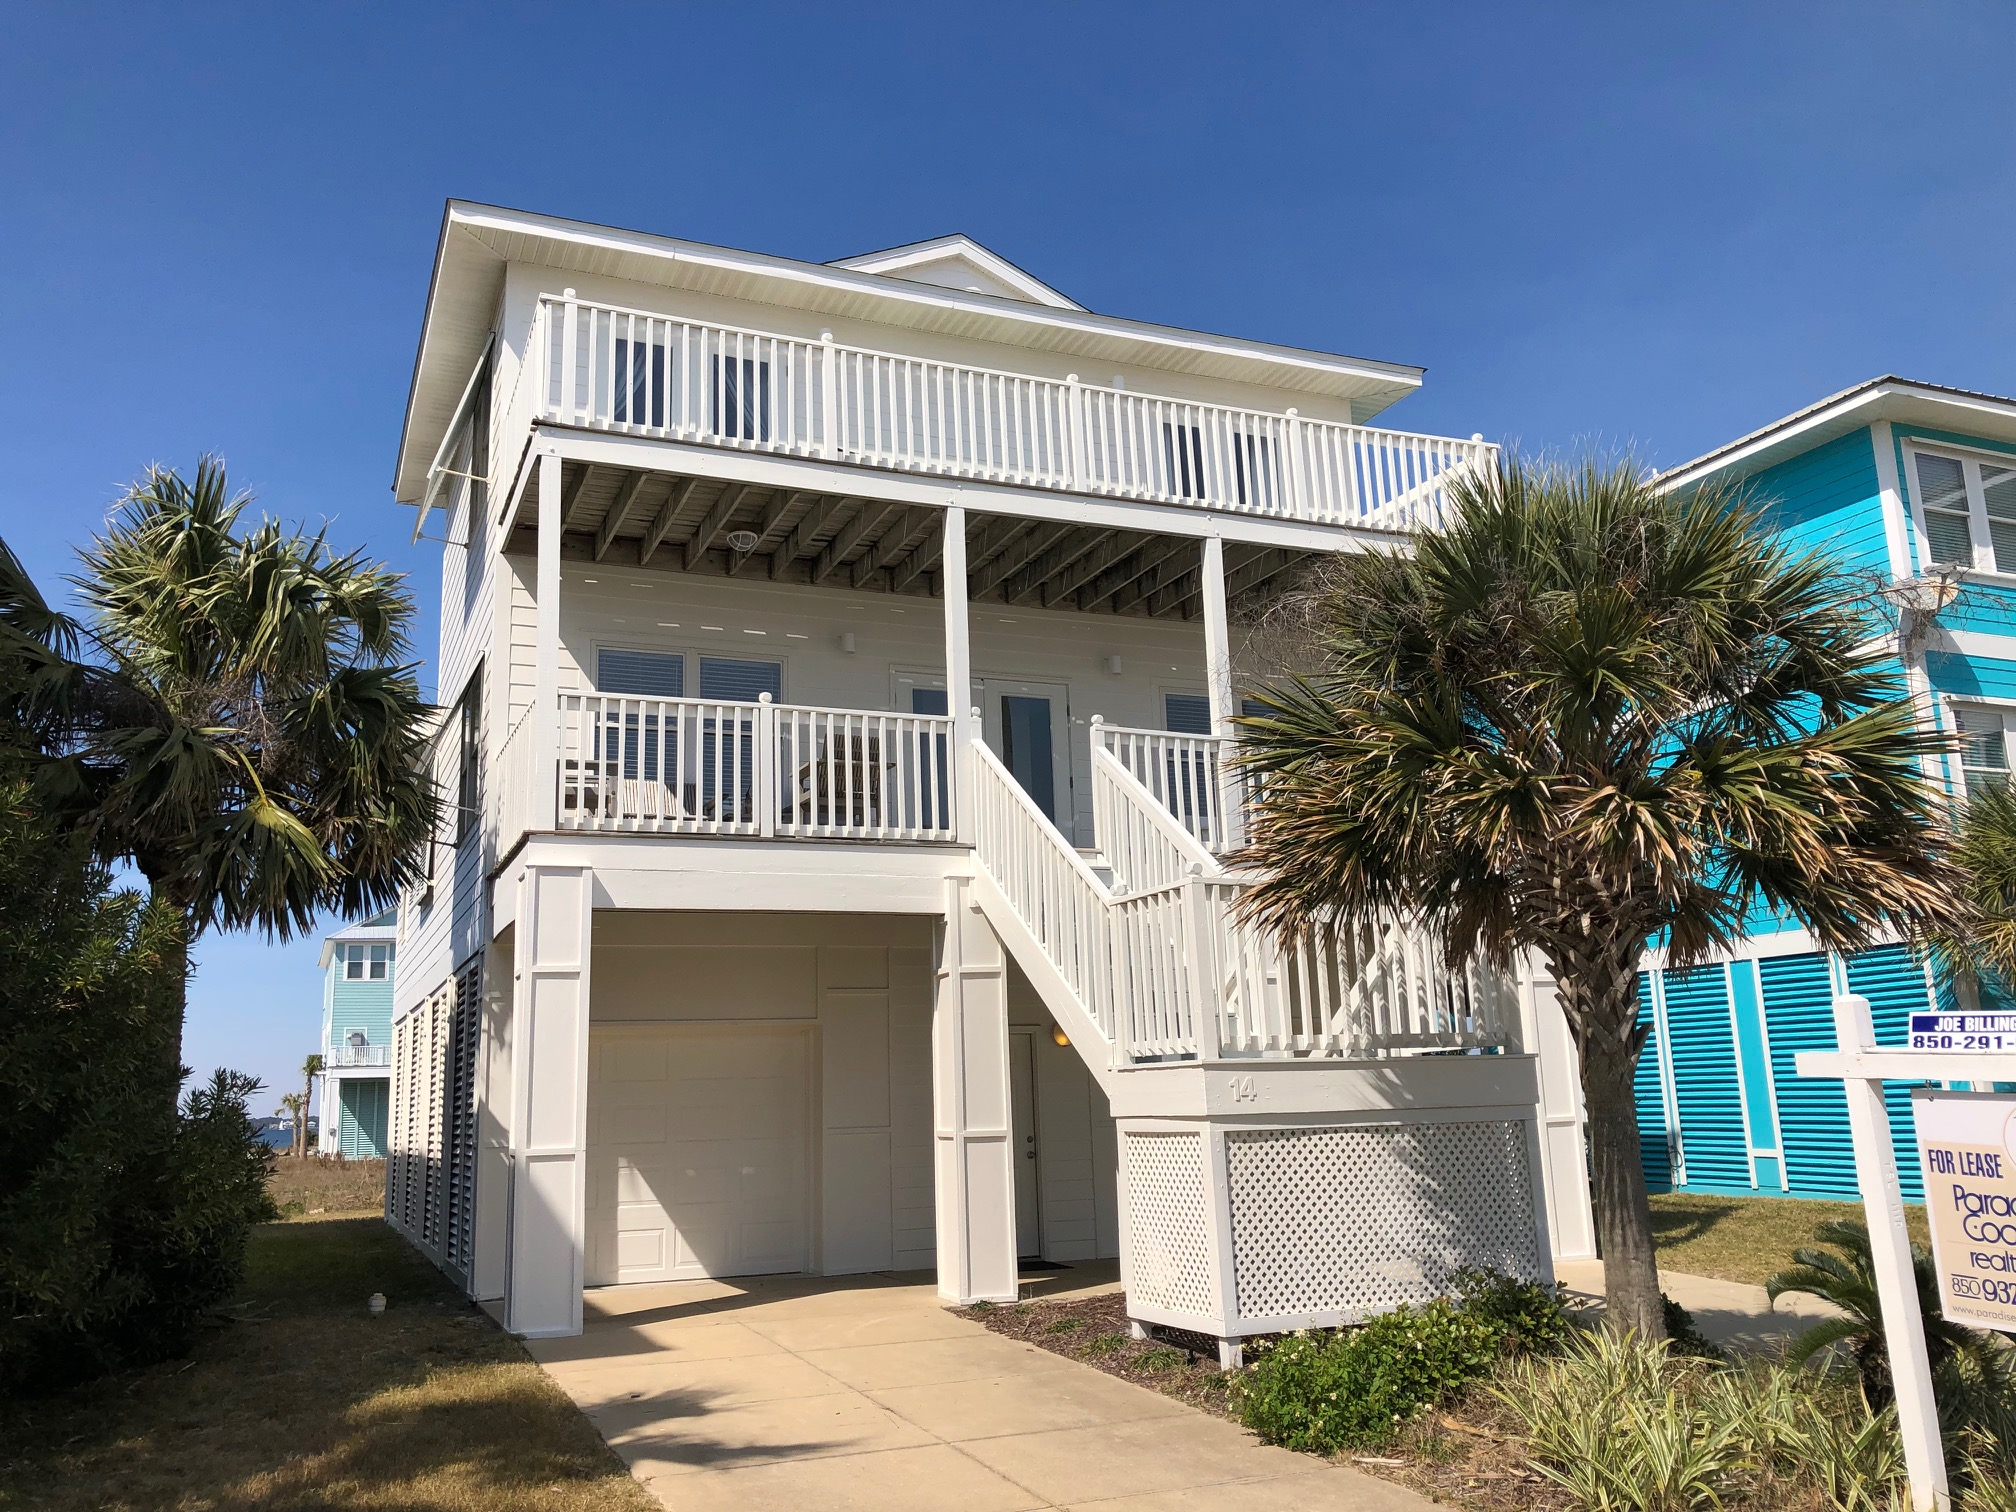 Ensenada Marbella 14 House/Cottage rental in Pensacola Beach House Rentals in Pensacola Beach Florida - #51